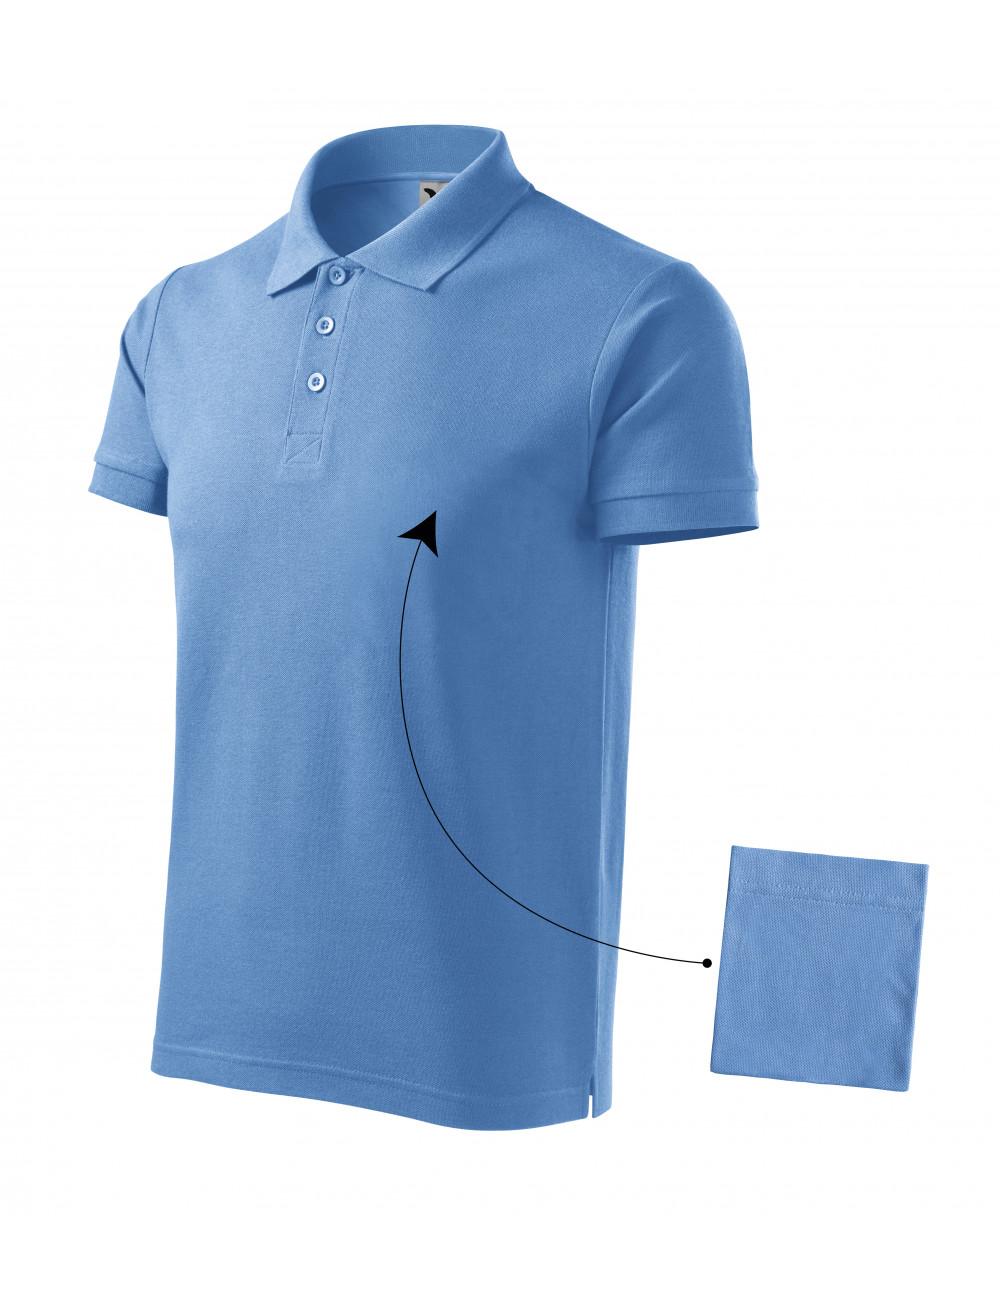 Adler MALFINI Koszulka polo męska Cotton 212 błękitny